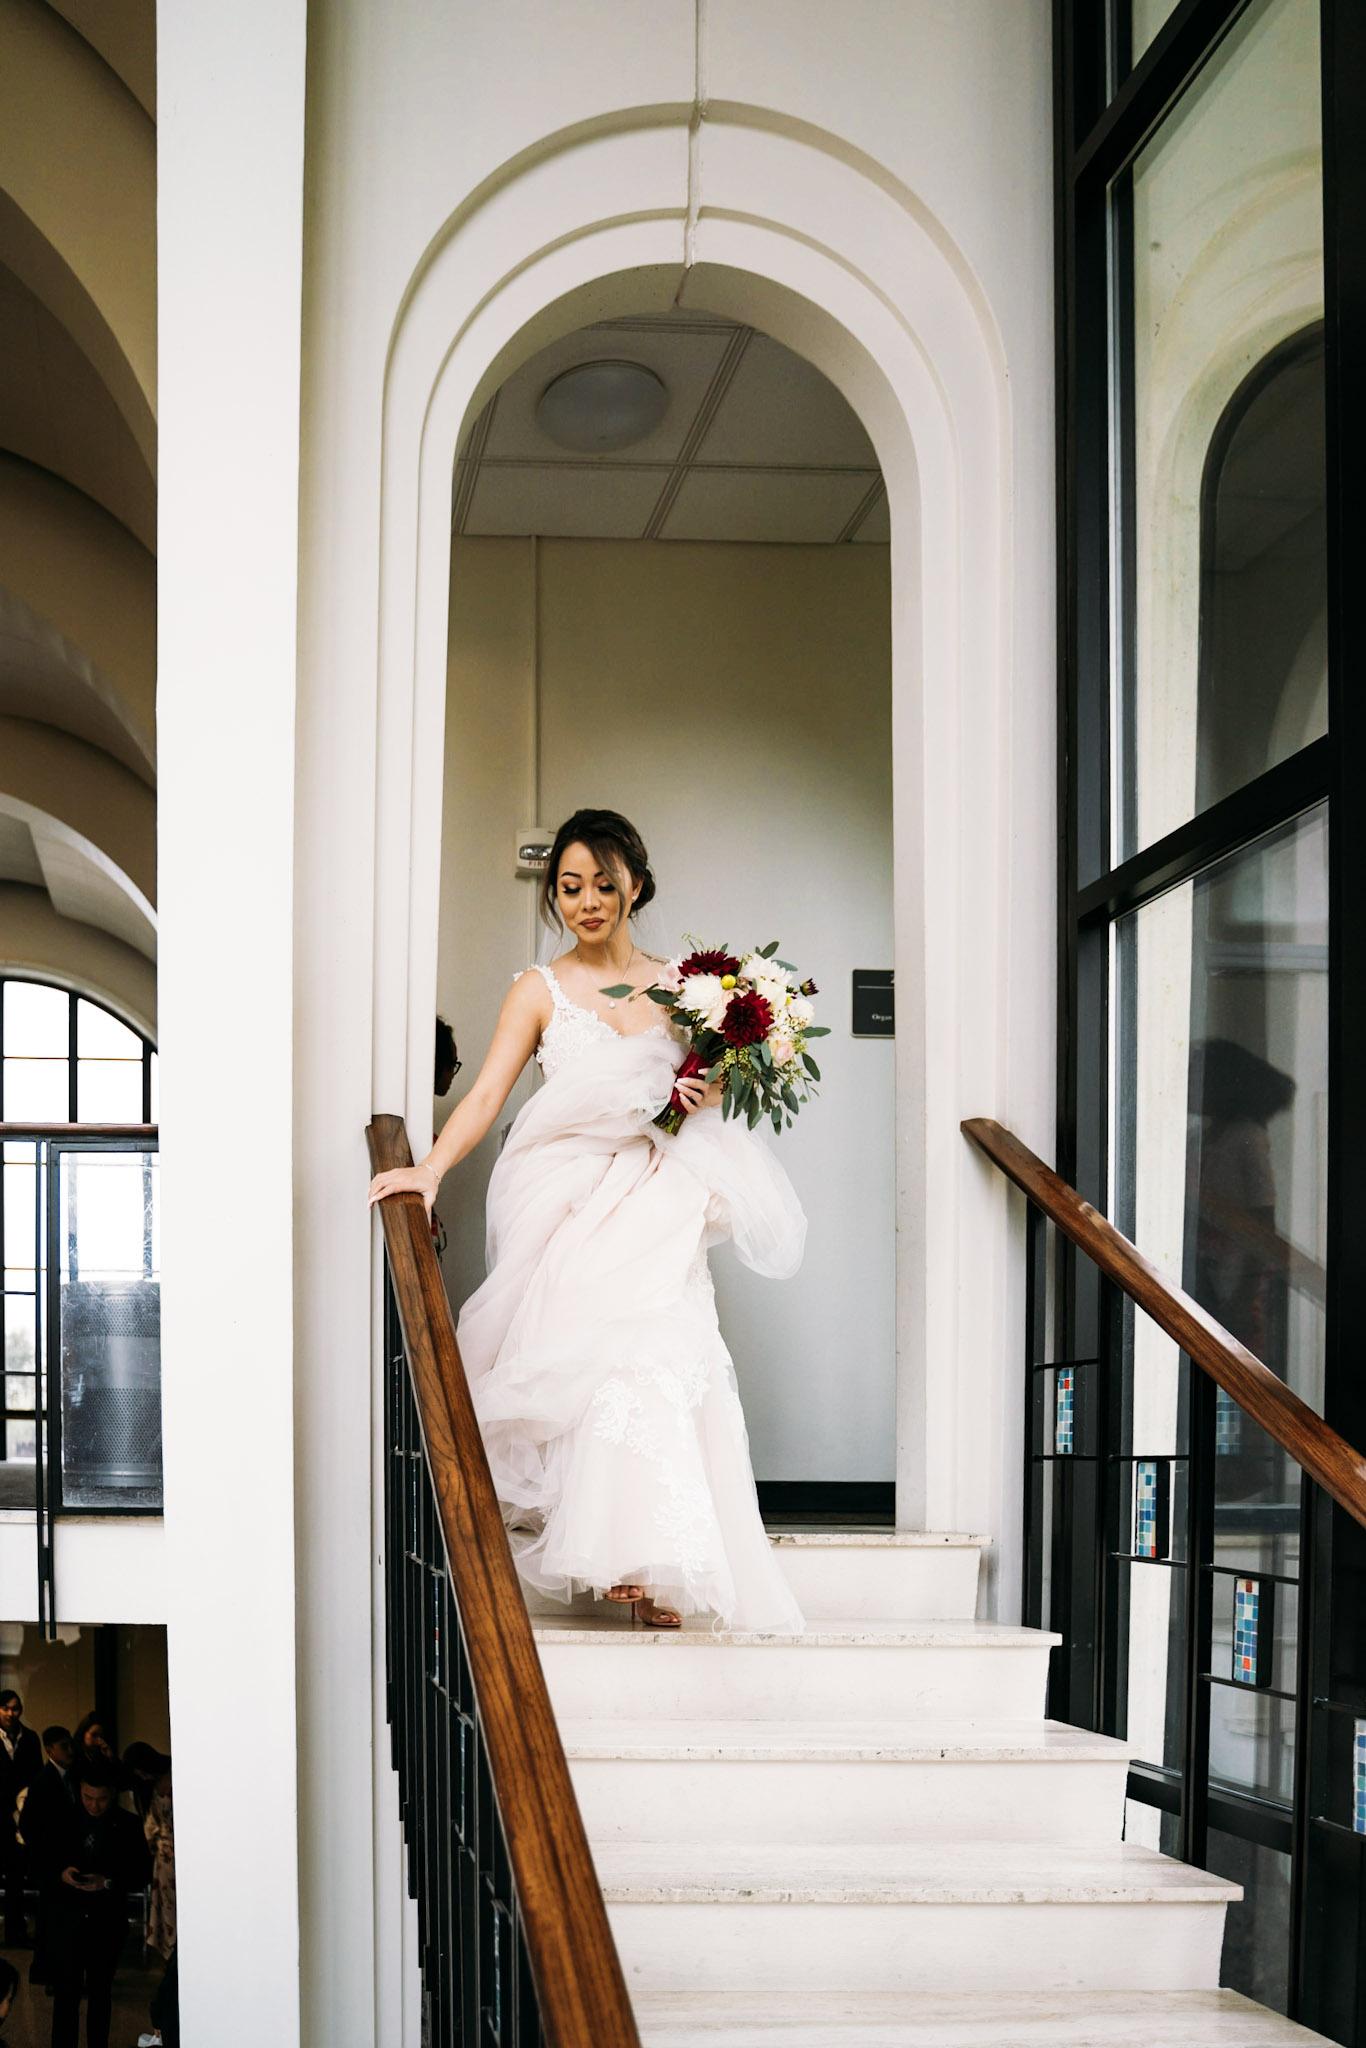 20190209-Cindy-Efren-Zapata-Wedding_CR34829.JPG